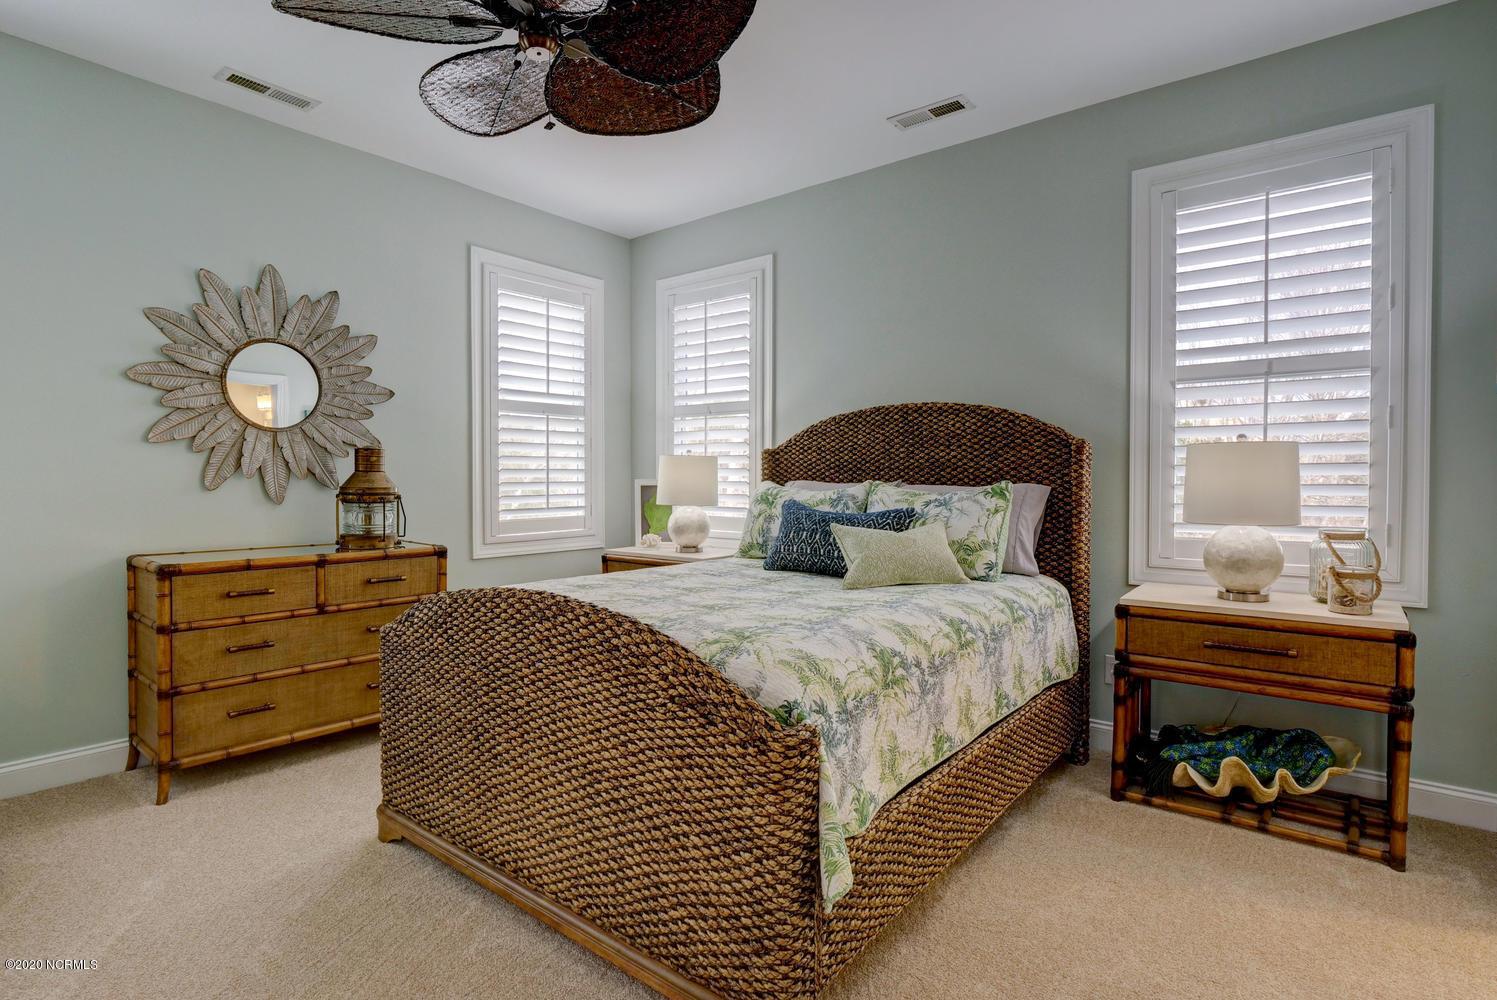 303 Marina View Drive, Southport, North Carolina 28461, 2 Bedrooms Bedrooms, 4 Rooms Rooms,2 BathroomsBathrooms,Condominium,For sale,Marina View,100231388